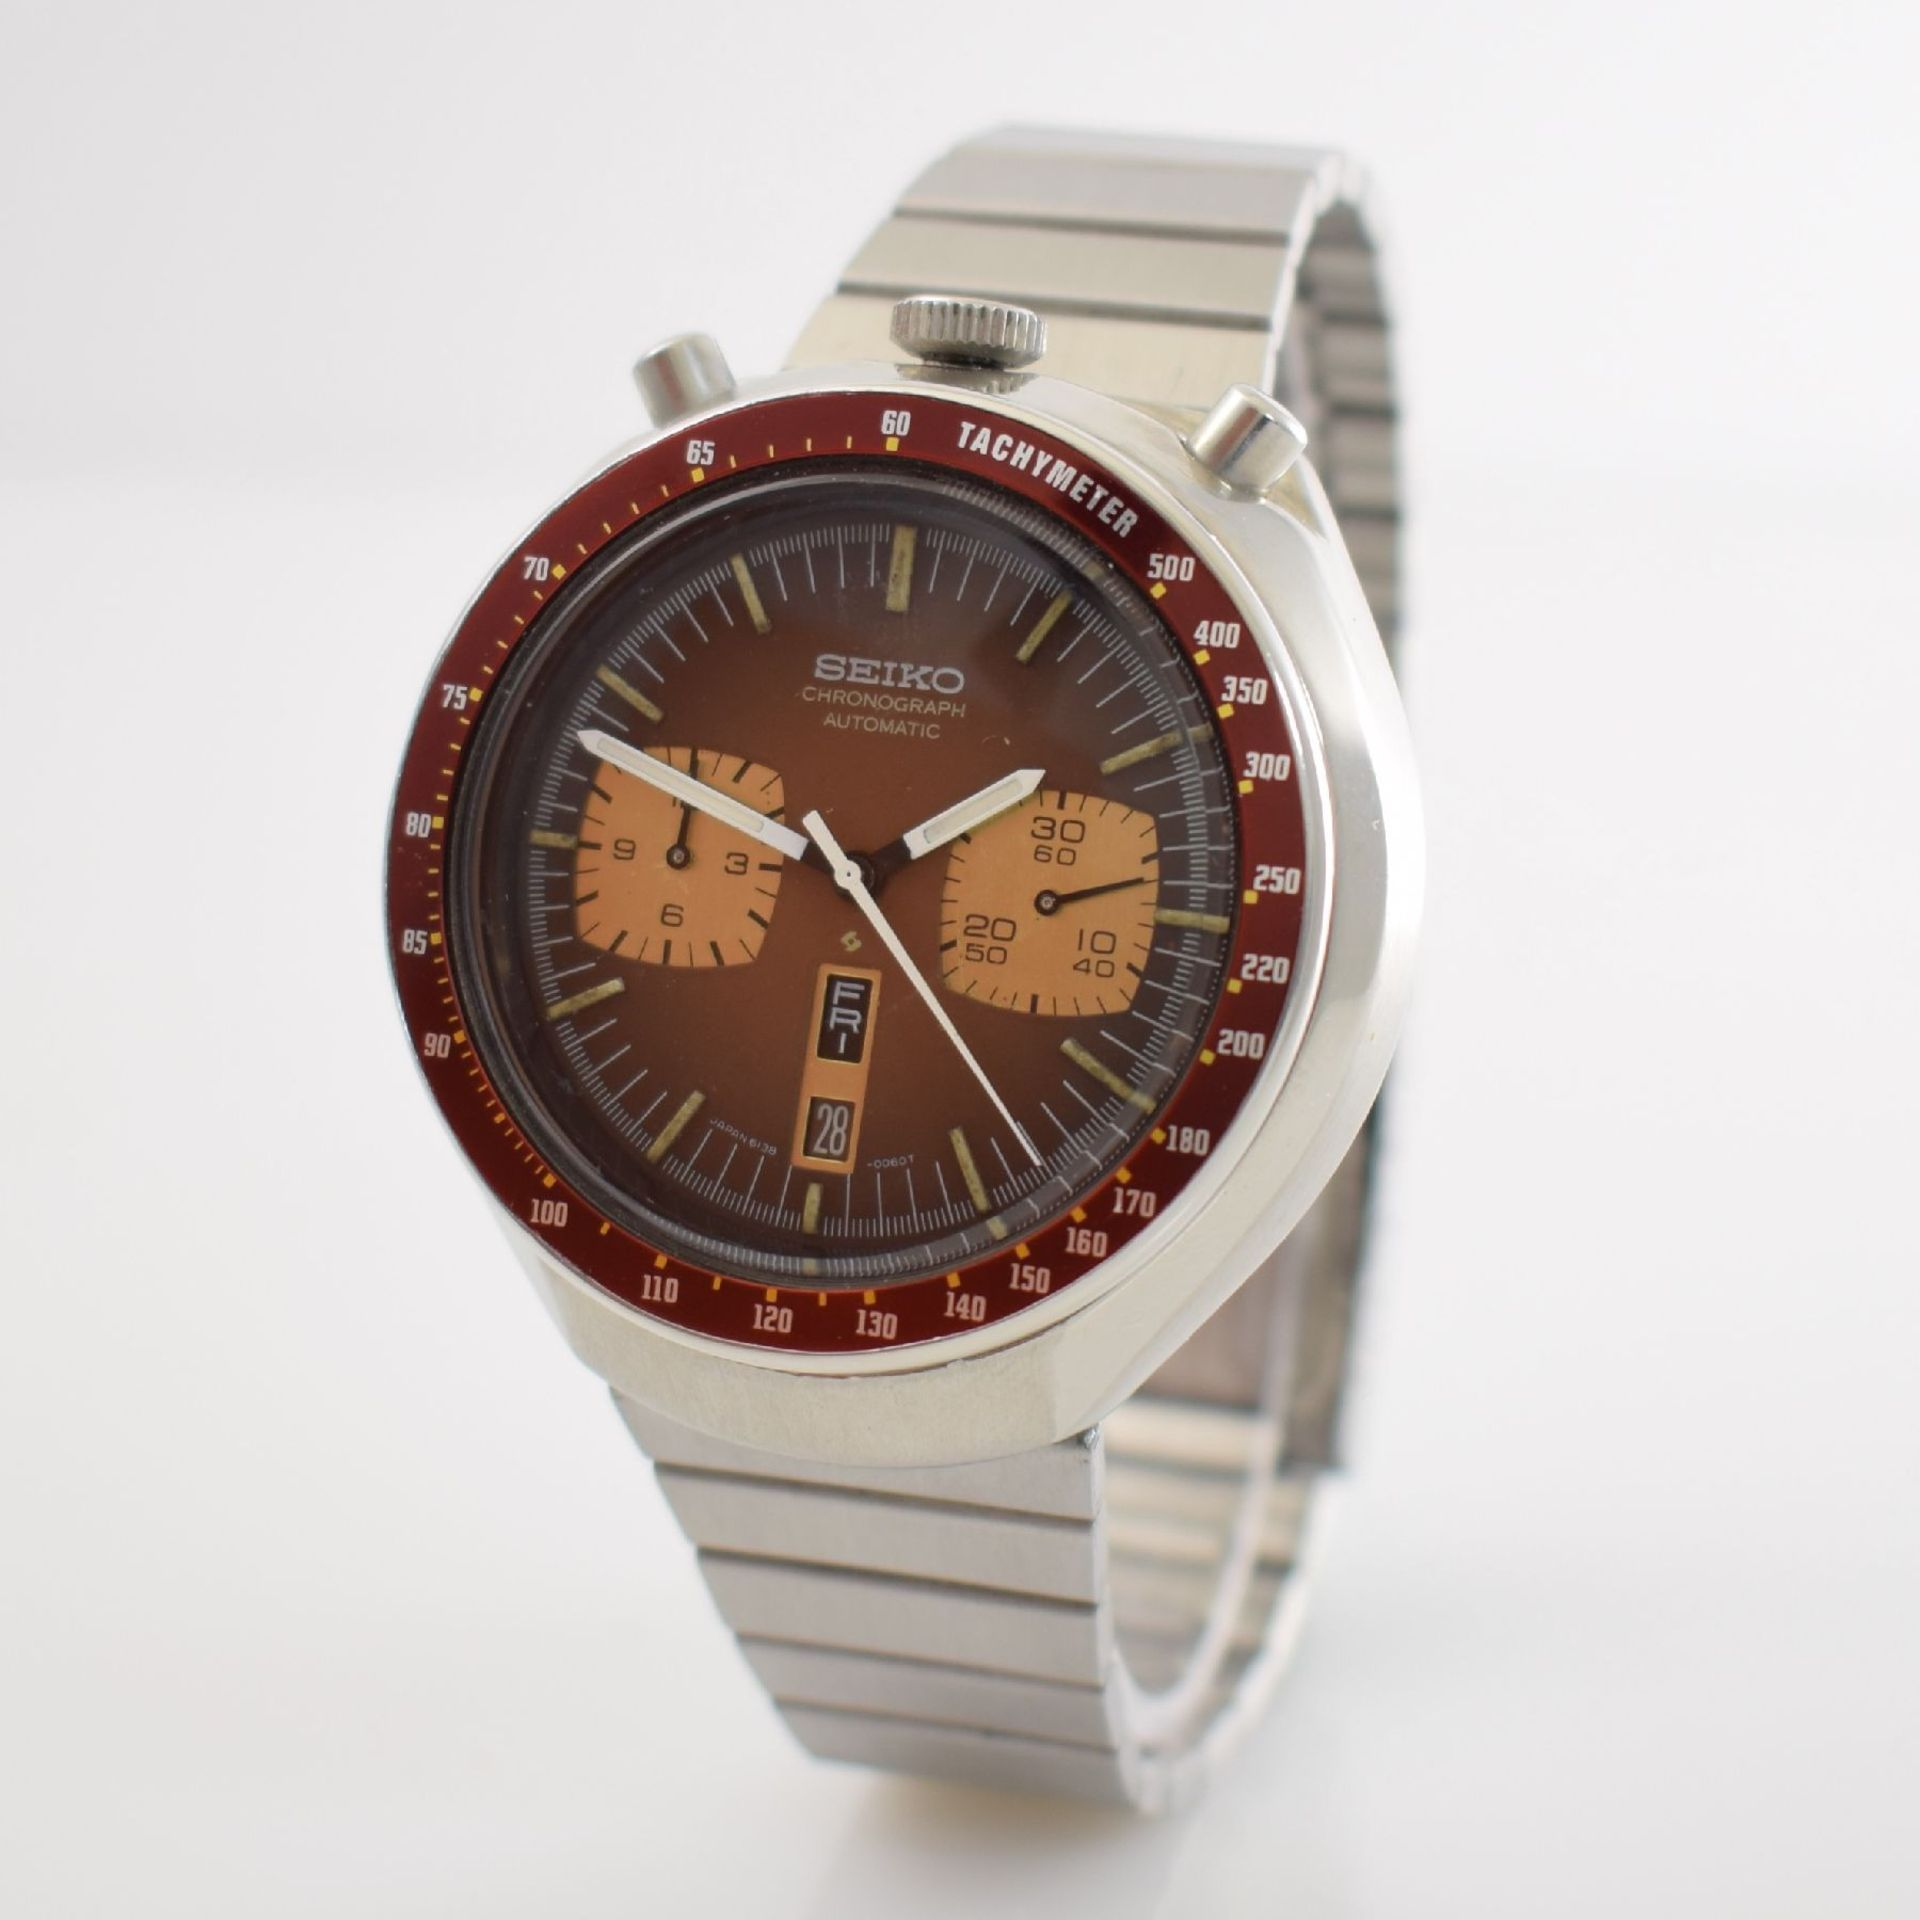 SEIKO sog. BULLHEAD Armbandchronograph, Japan um 1970, Automatik, Ref. 6138-0040, verschr. - Bild 3 aus 7